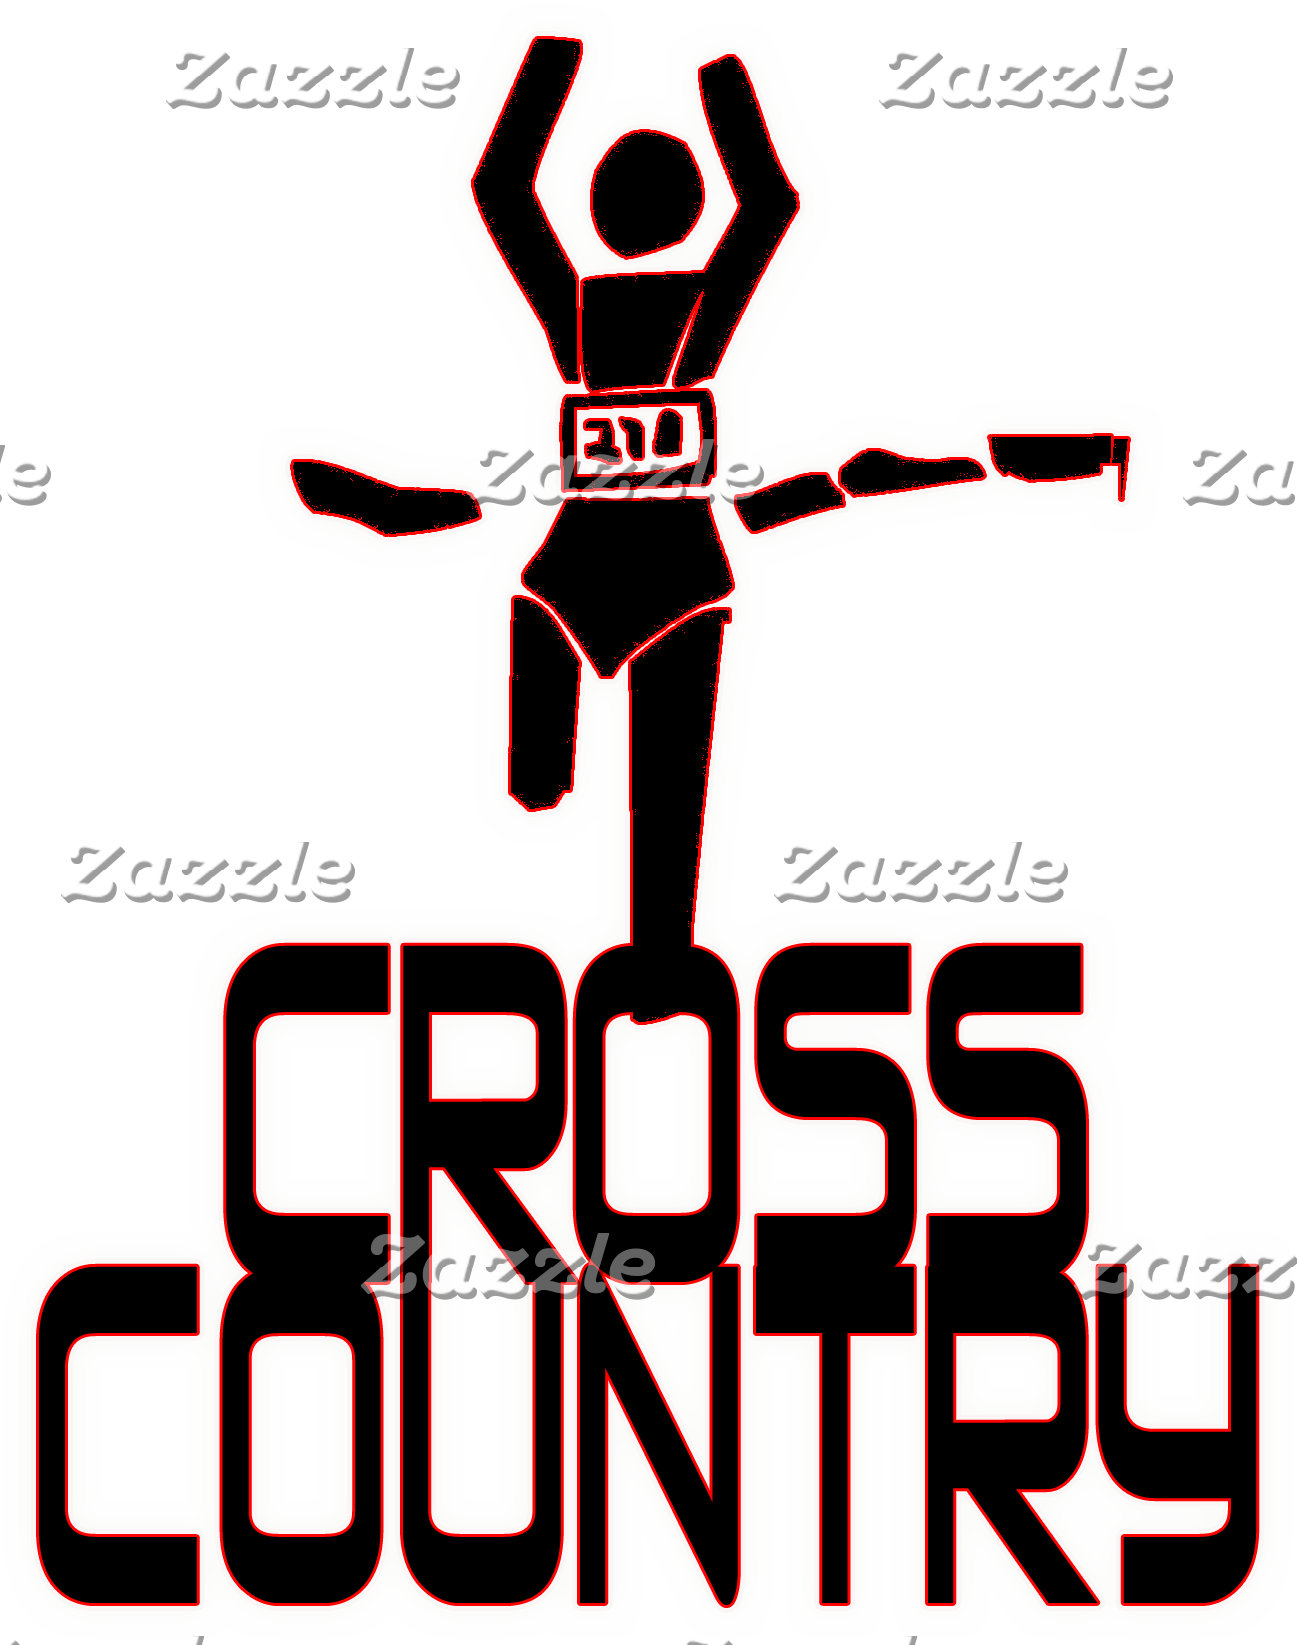 CROSS COUNTRY FINISH LINE - WINNER